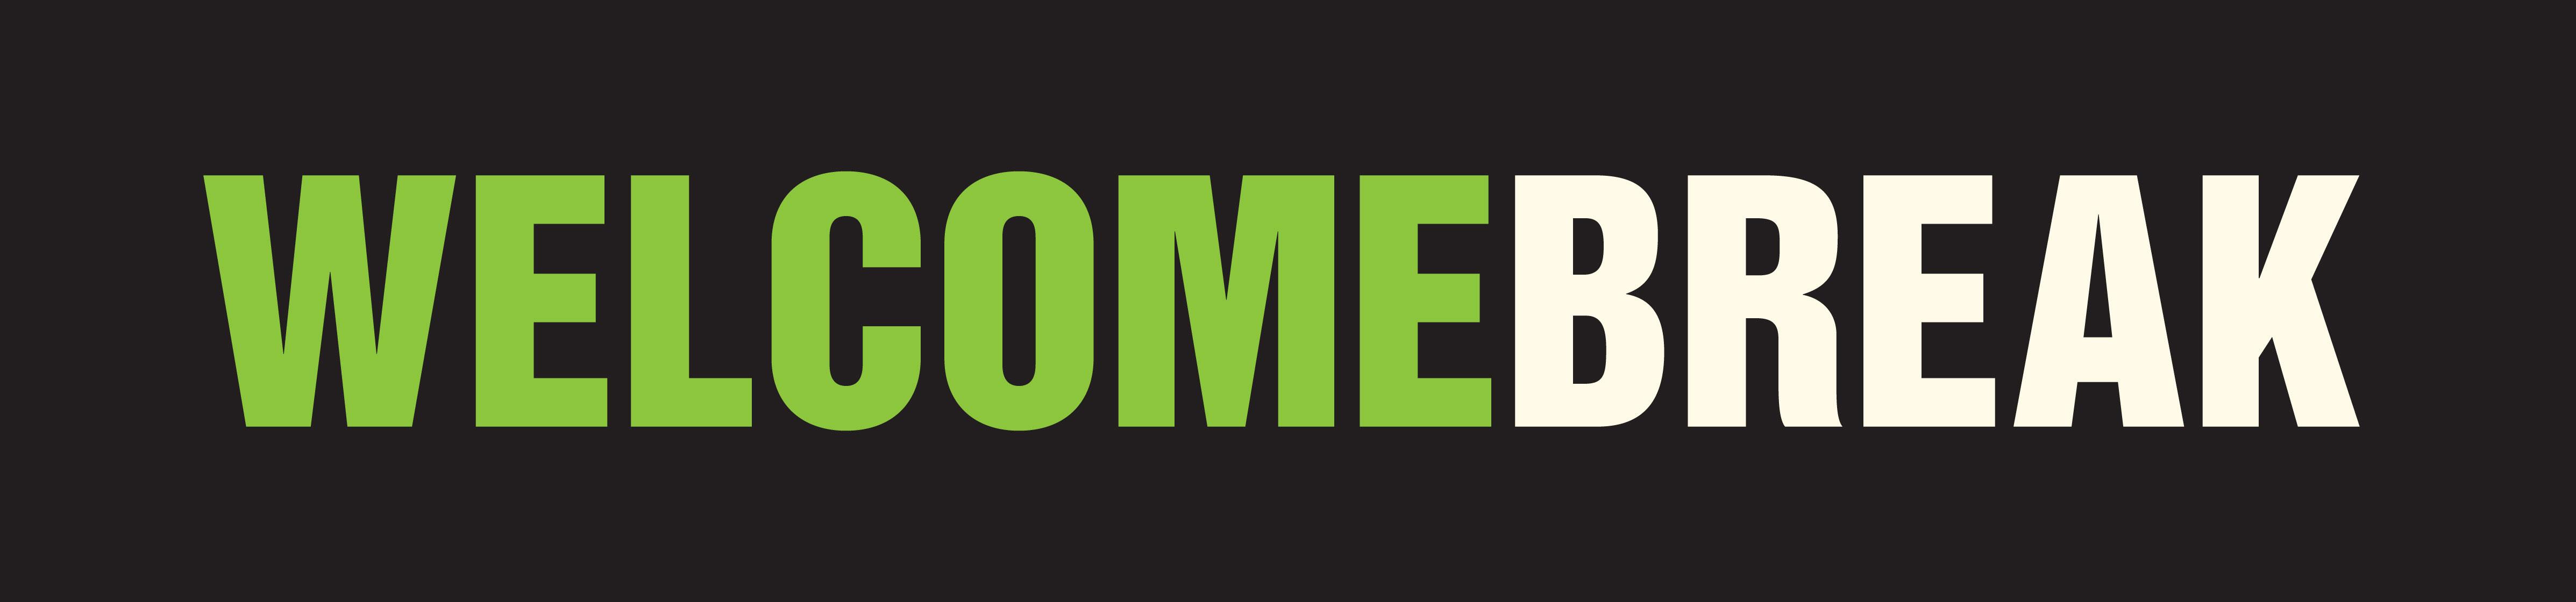 Welcome Break logo